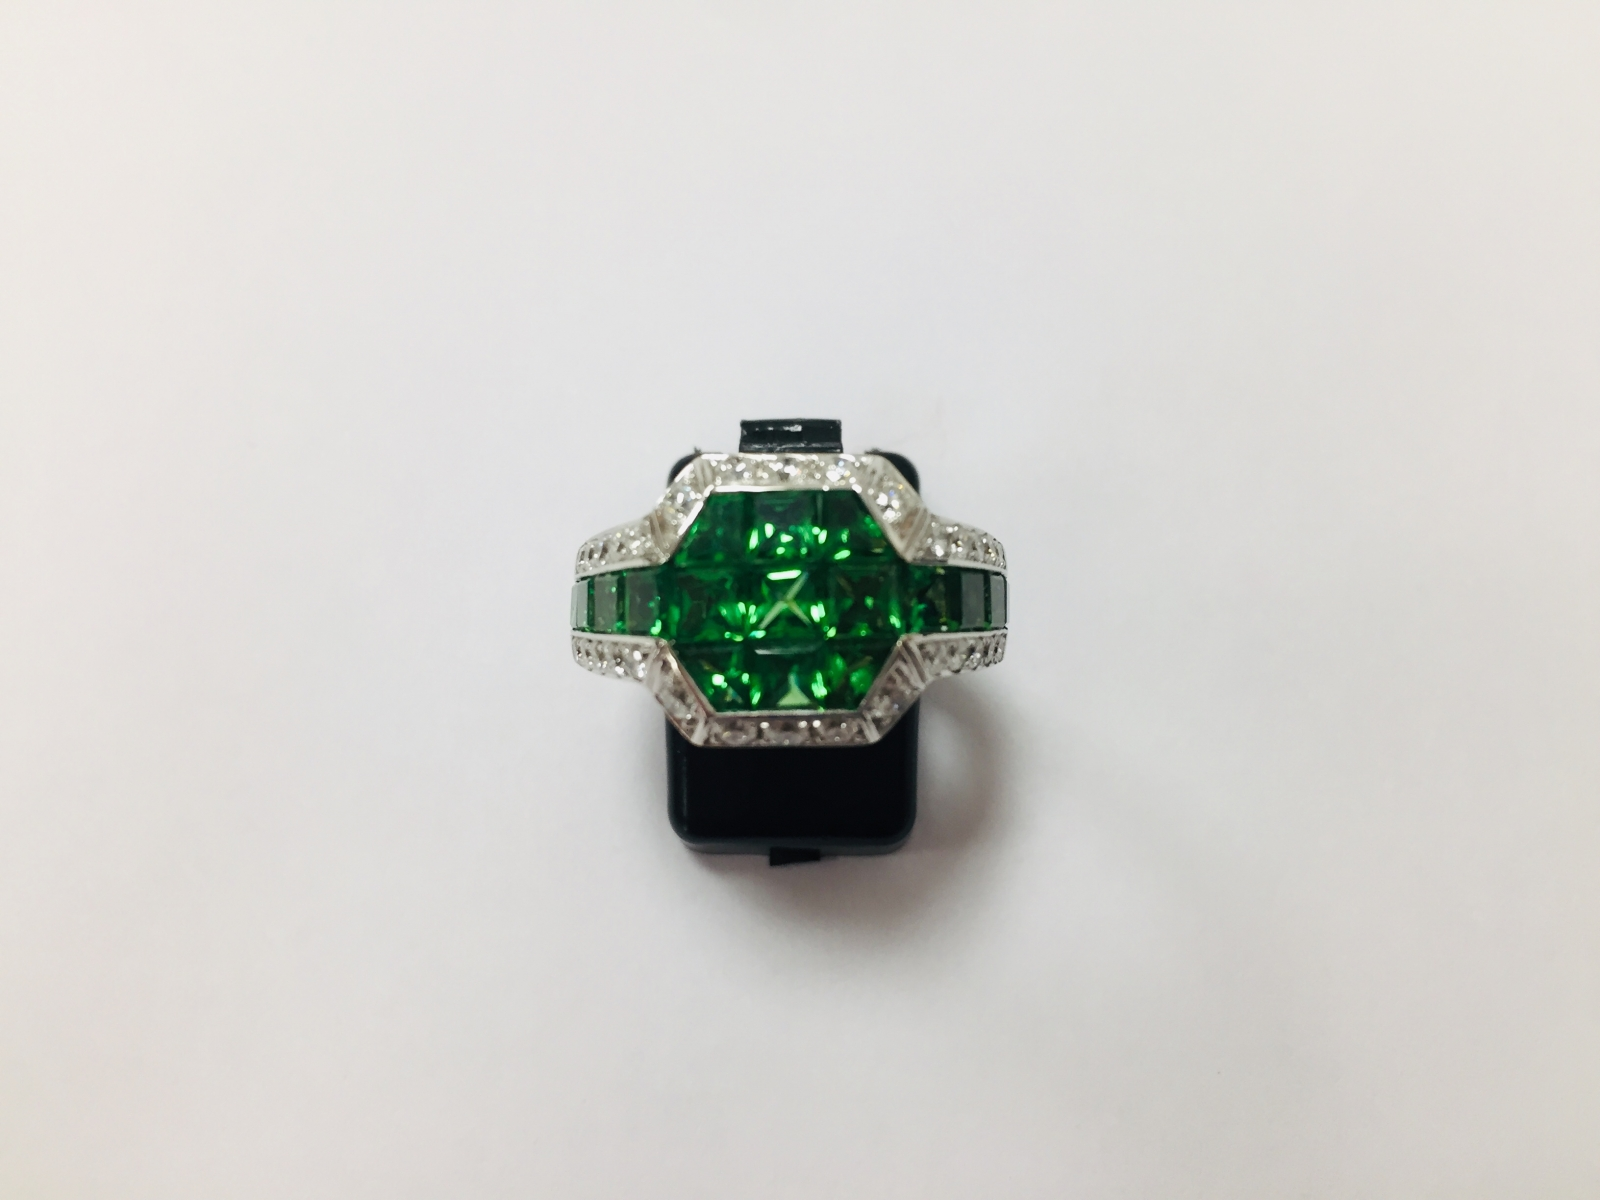 39 - Bague en or blanc18K 750° sertie invisible de grenats verts, tsavorites et diamants. Adjugé 1000€